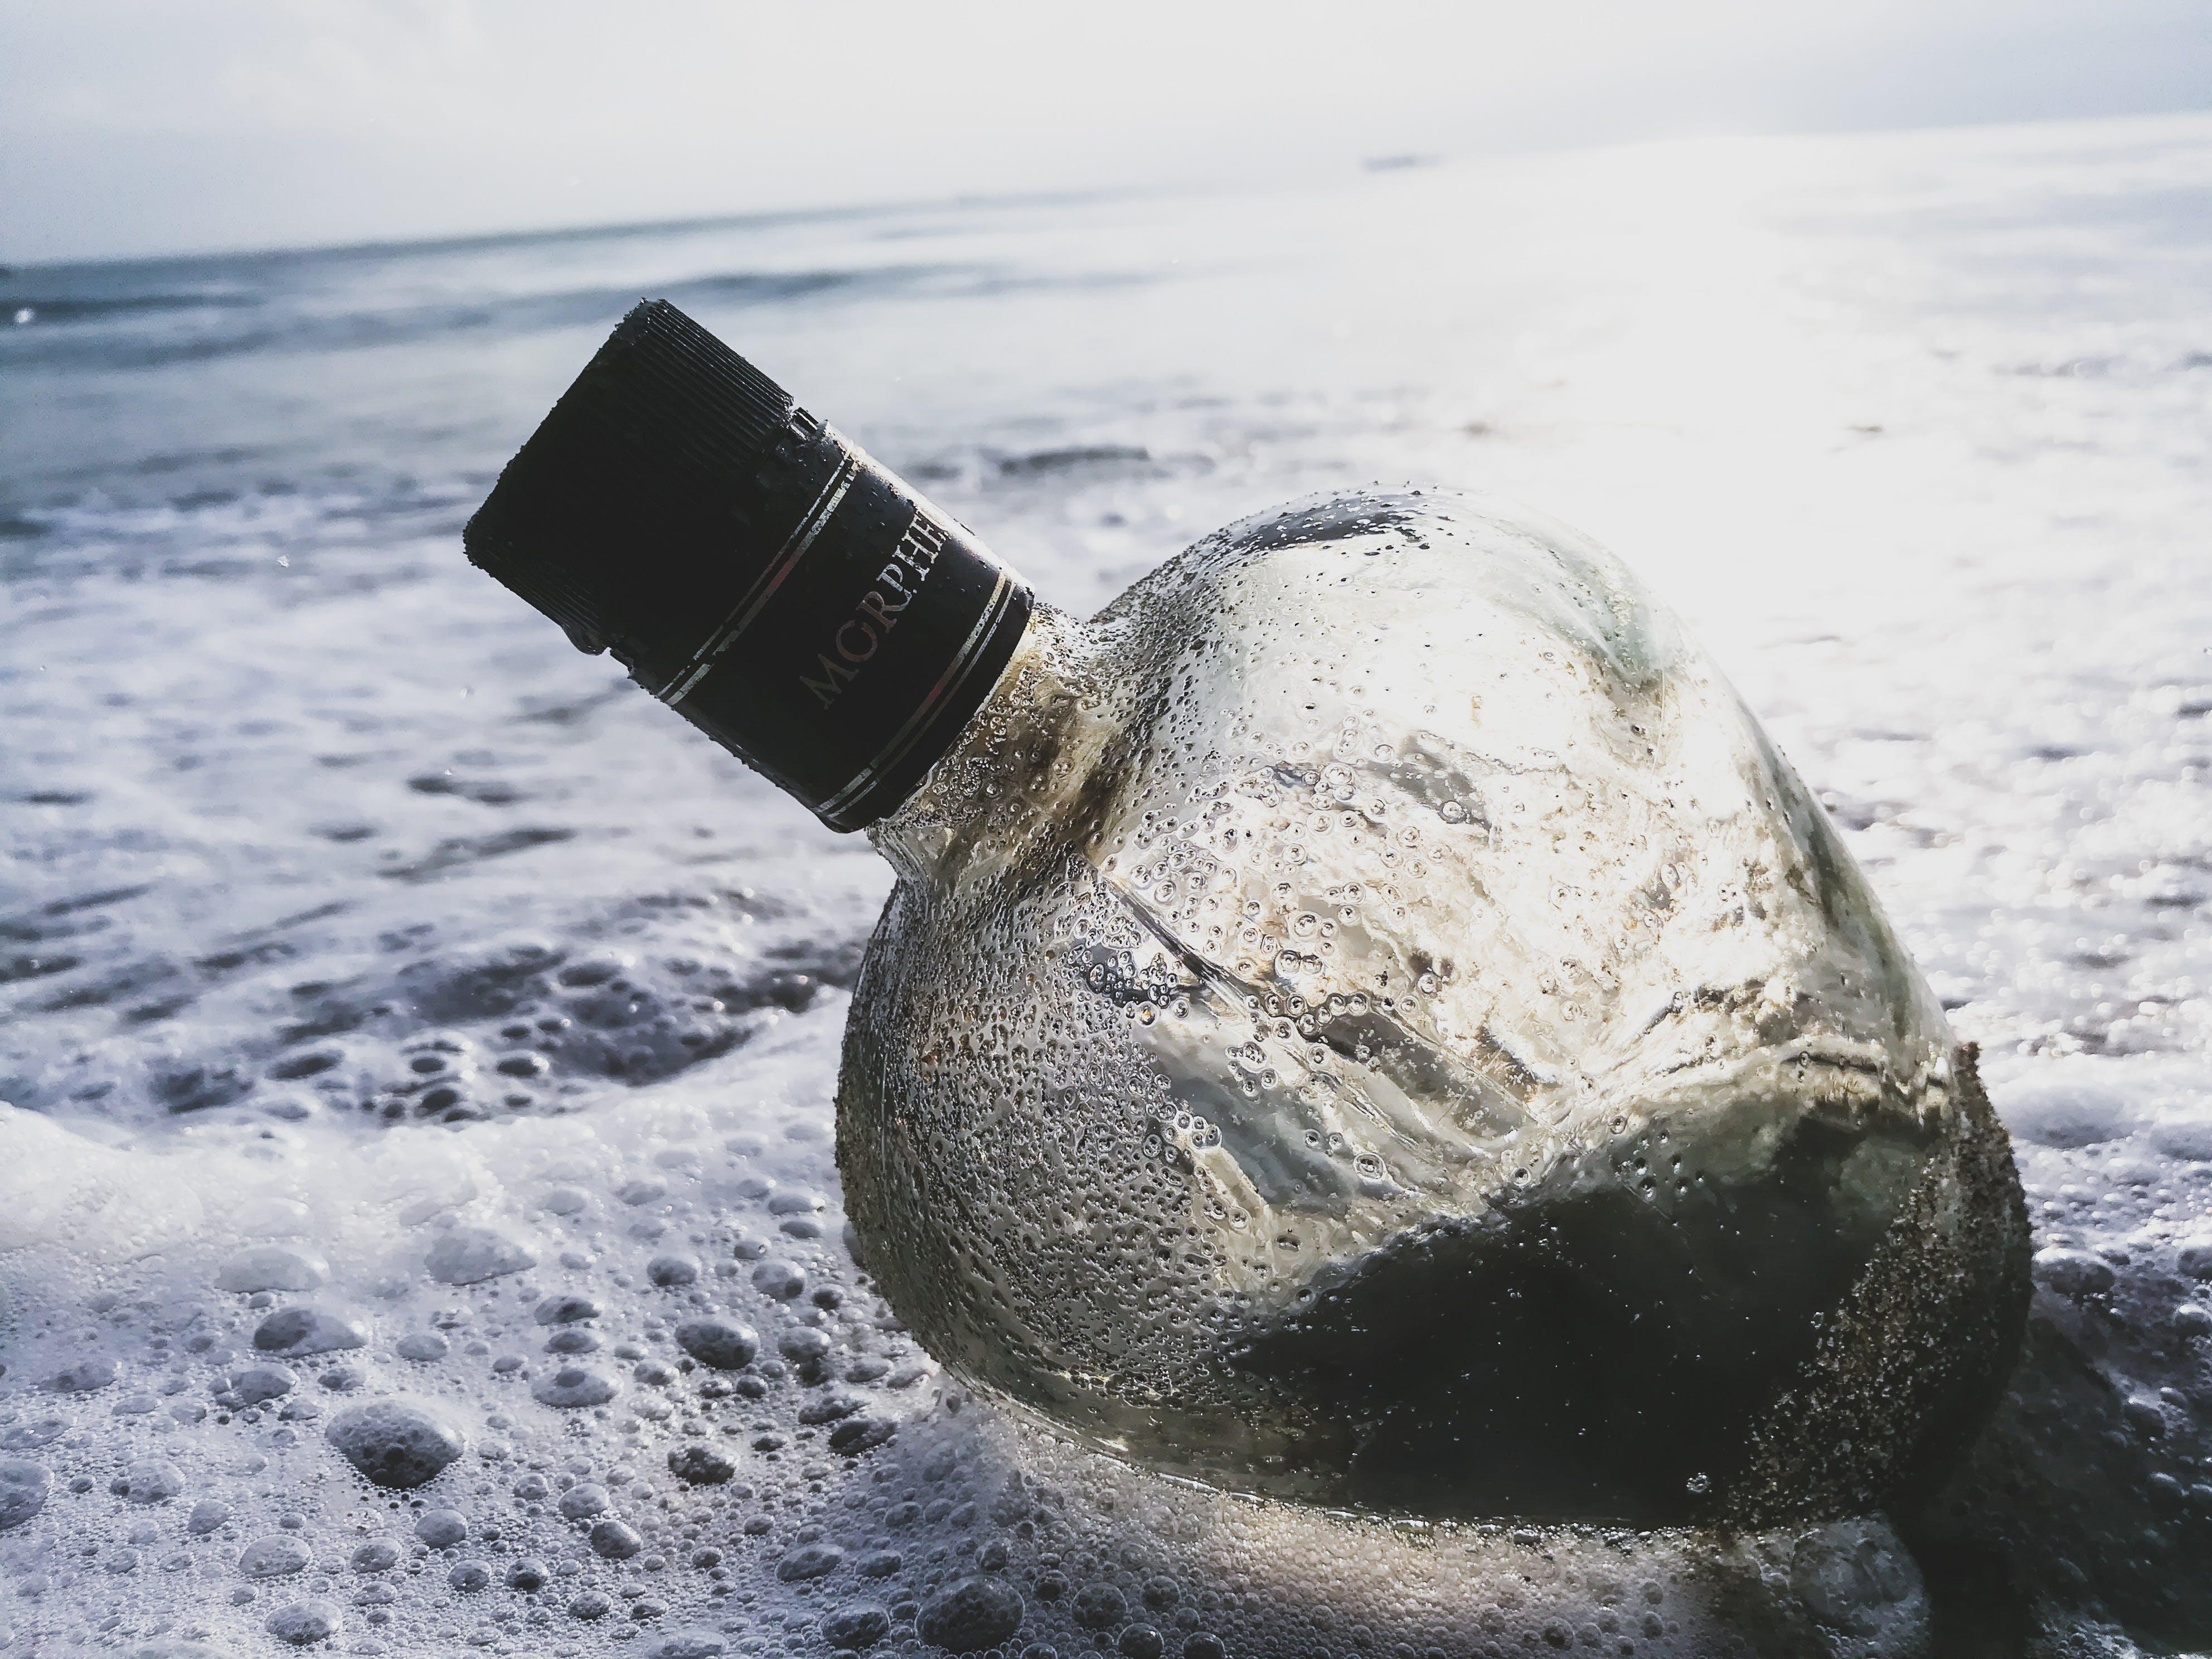 Clear Glass Bottle on Body of Water